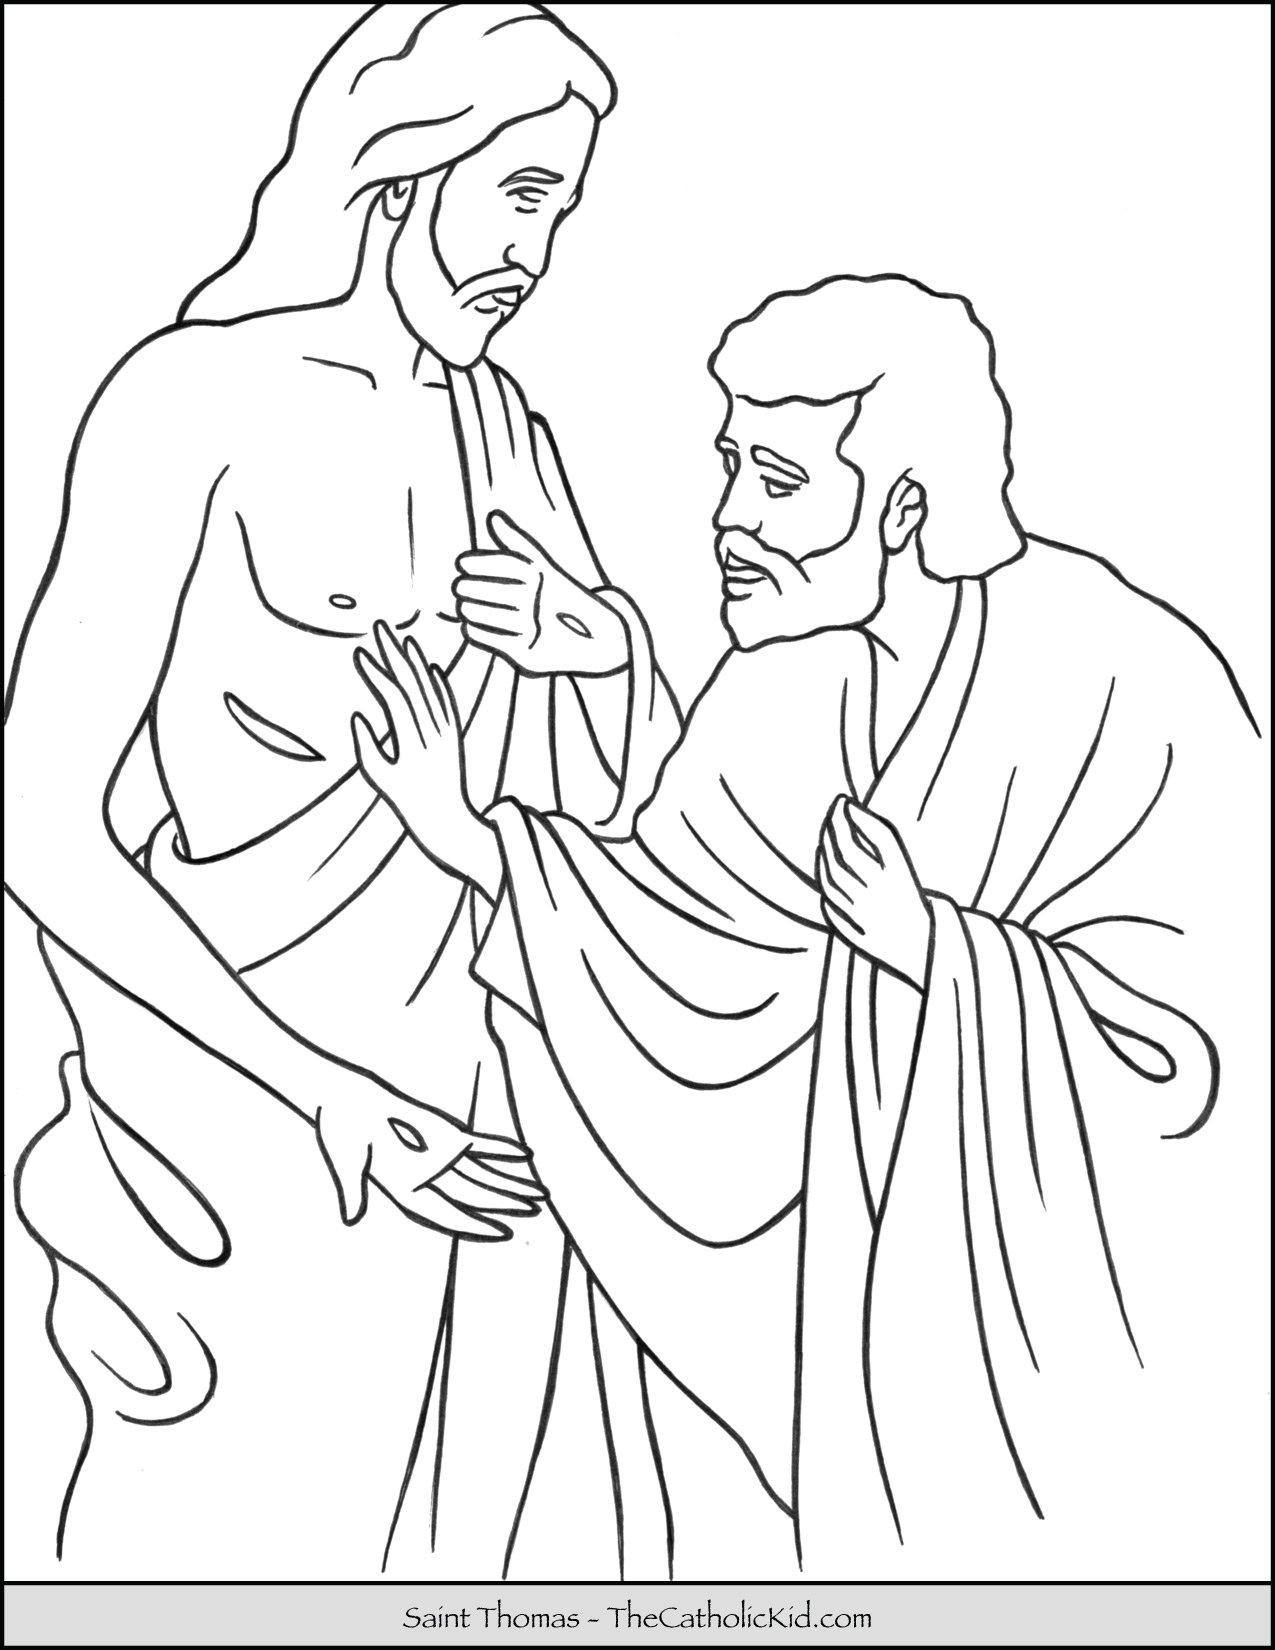 Saint Thomas Coloring Page Thecatholickid Com